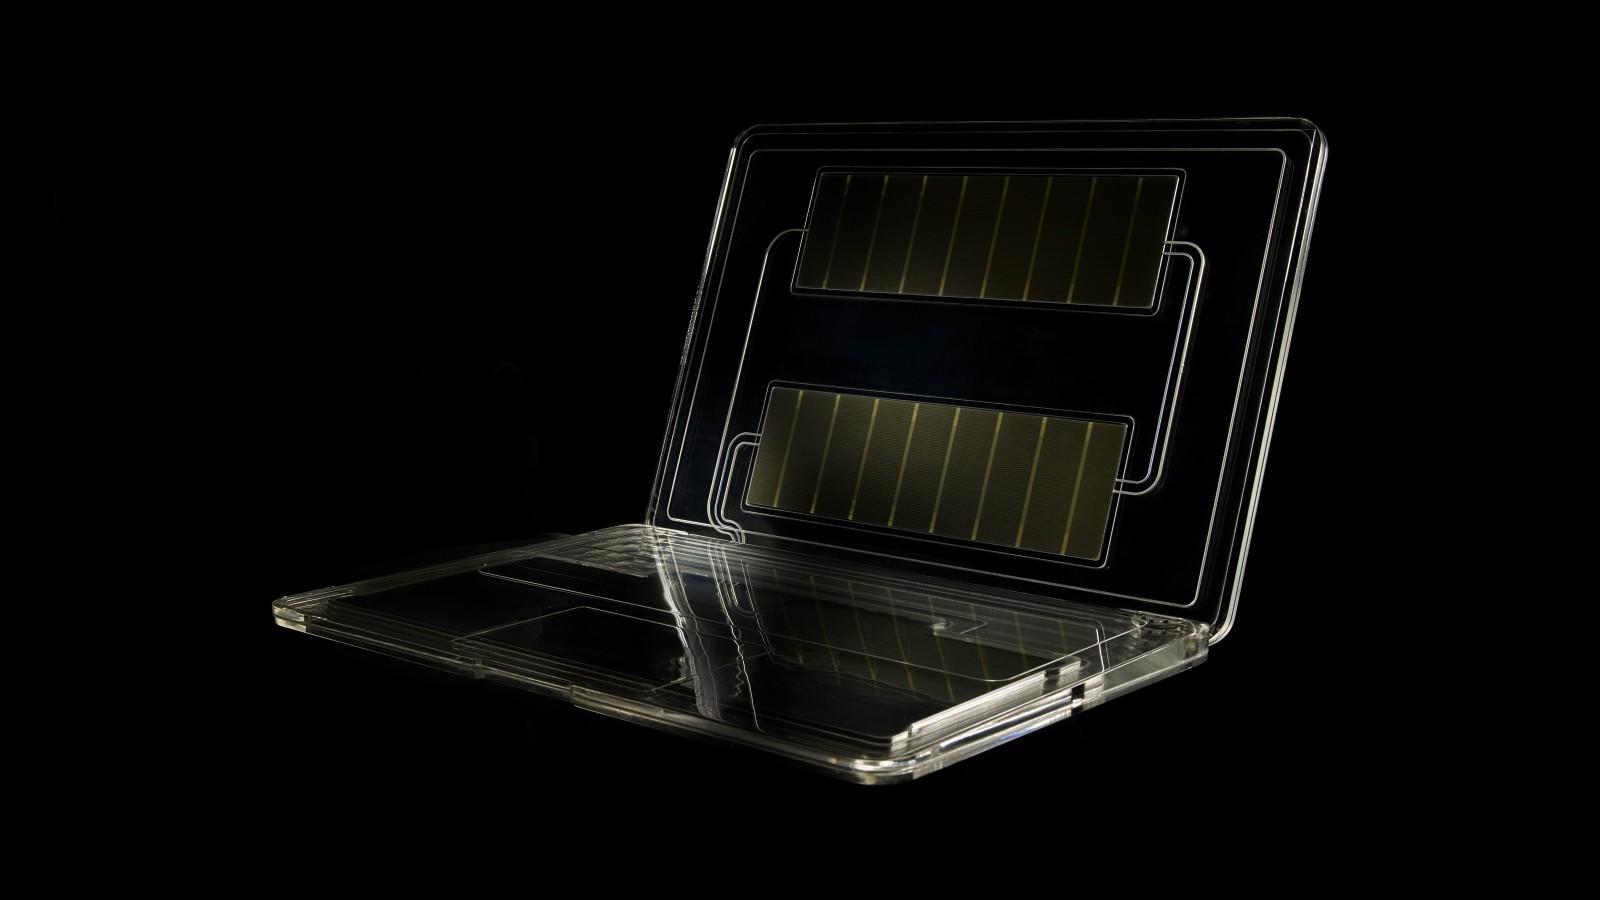 intelligent-energy-laptop-black